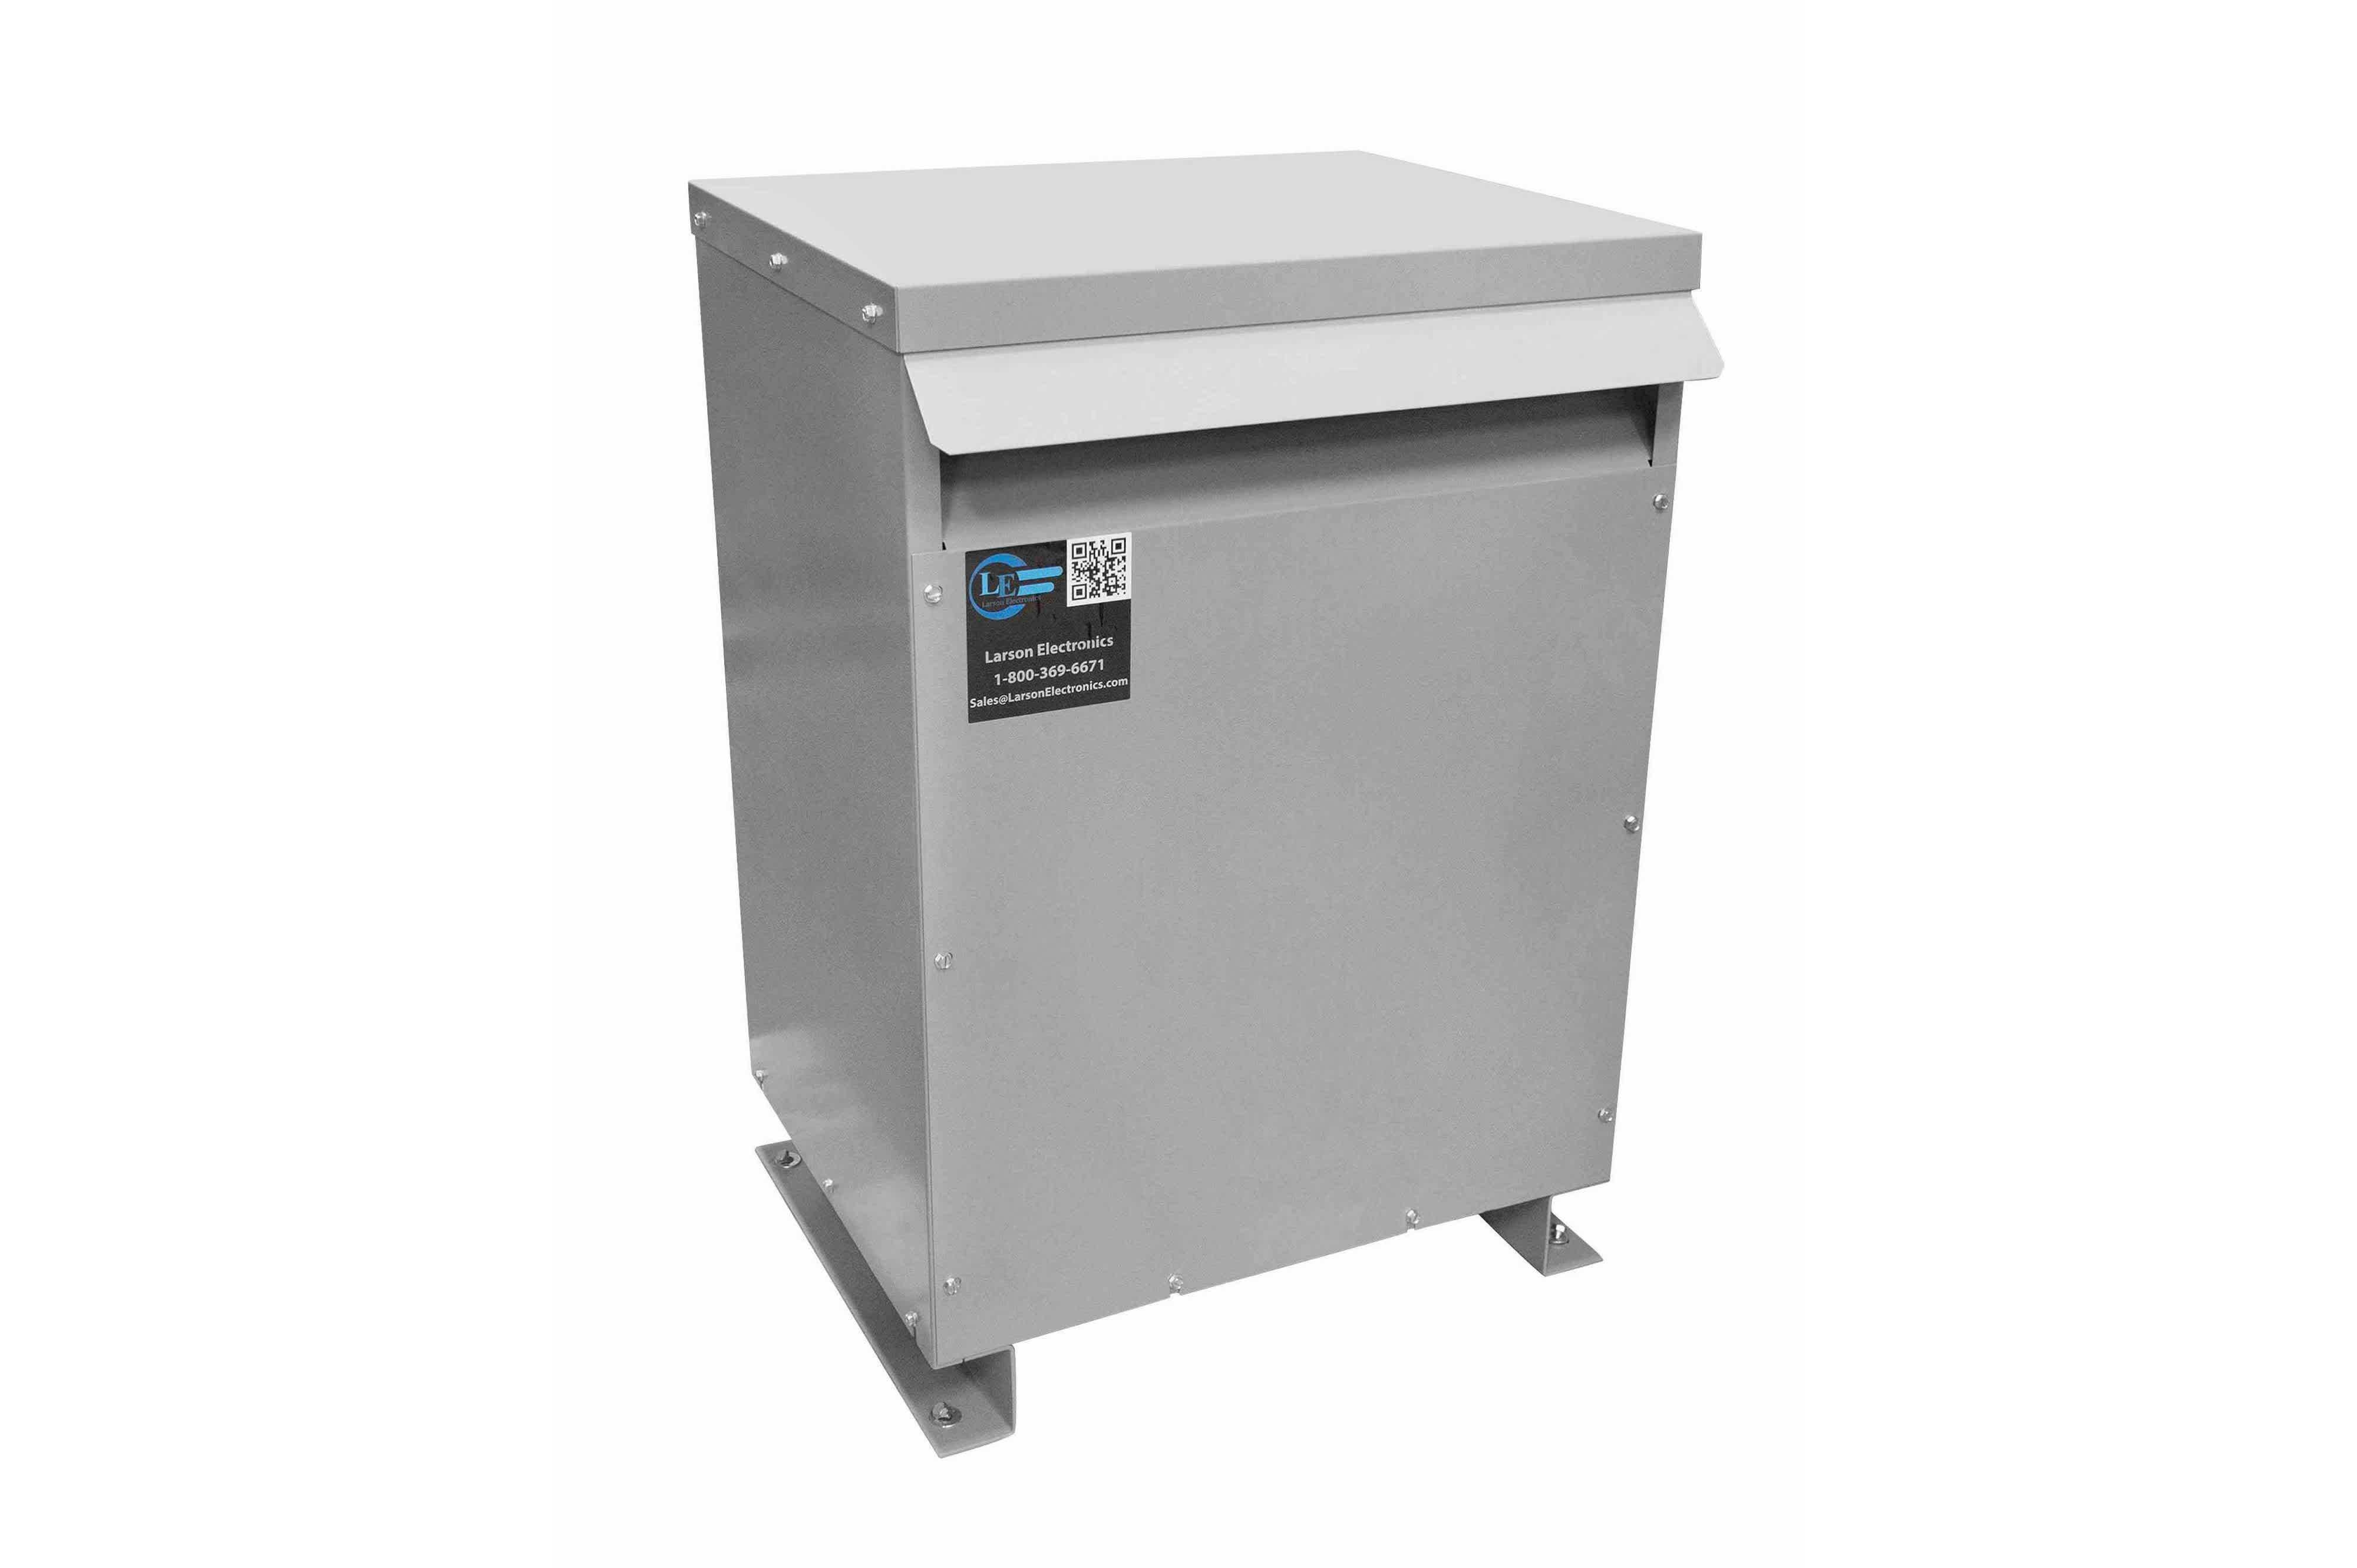 40 kVA 3PH Isolation Transformer, 208V Wye Primary, 208V Delta Secondary, N3R, Ventilated, 60 Hz